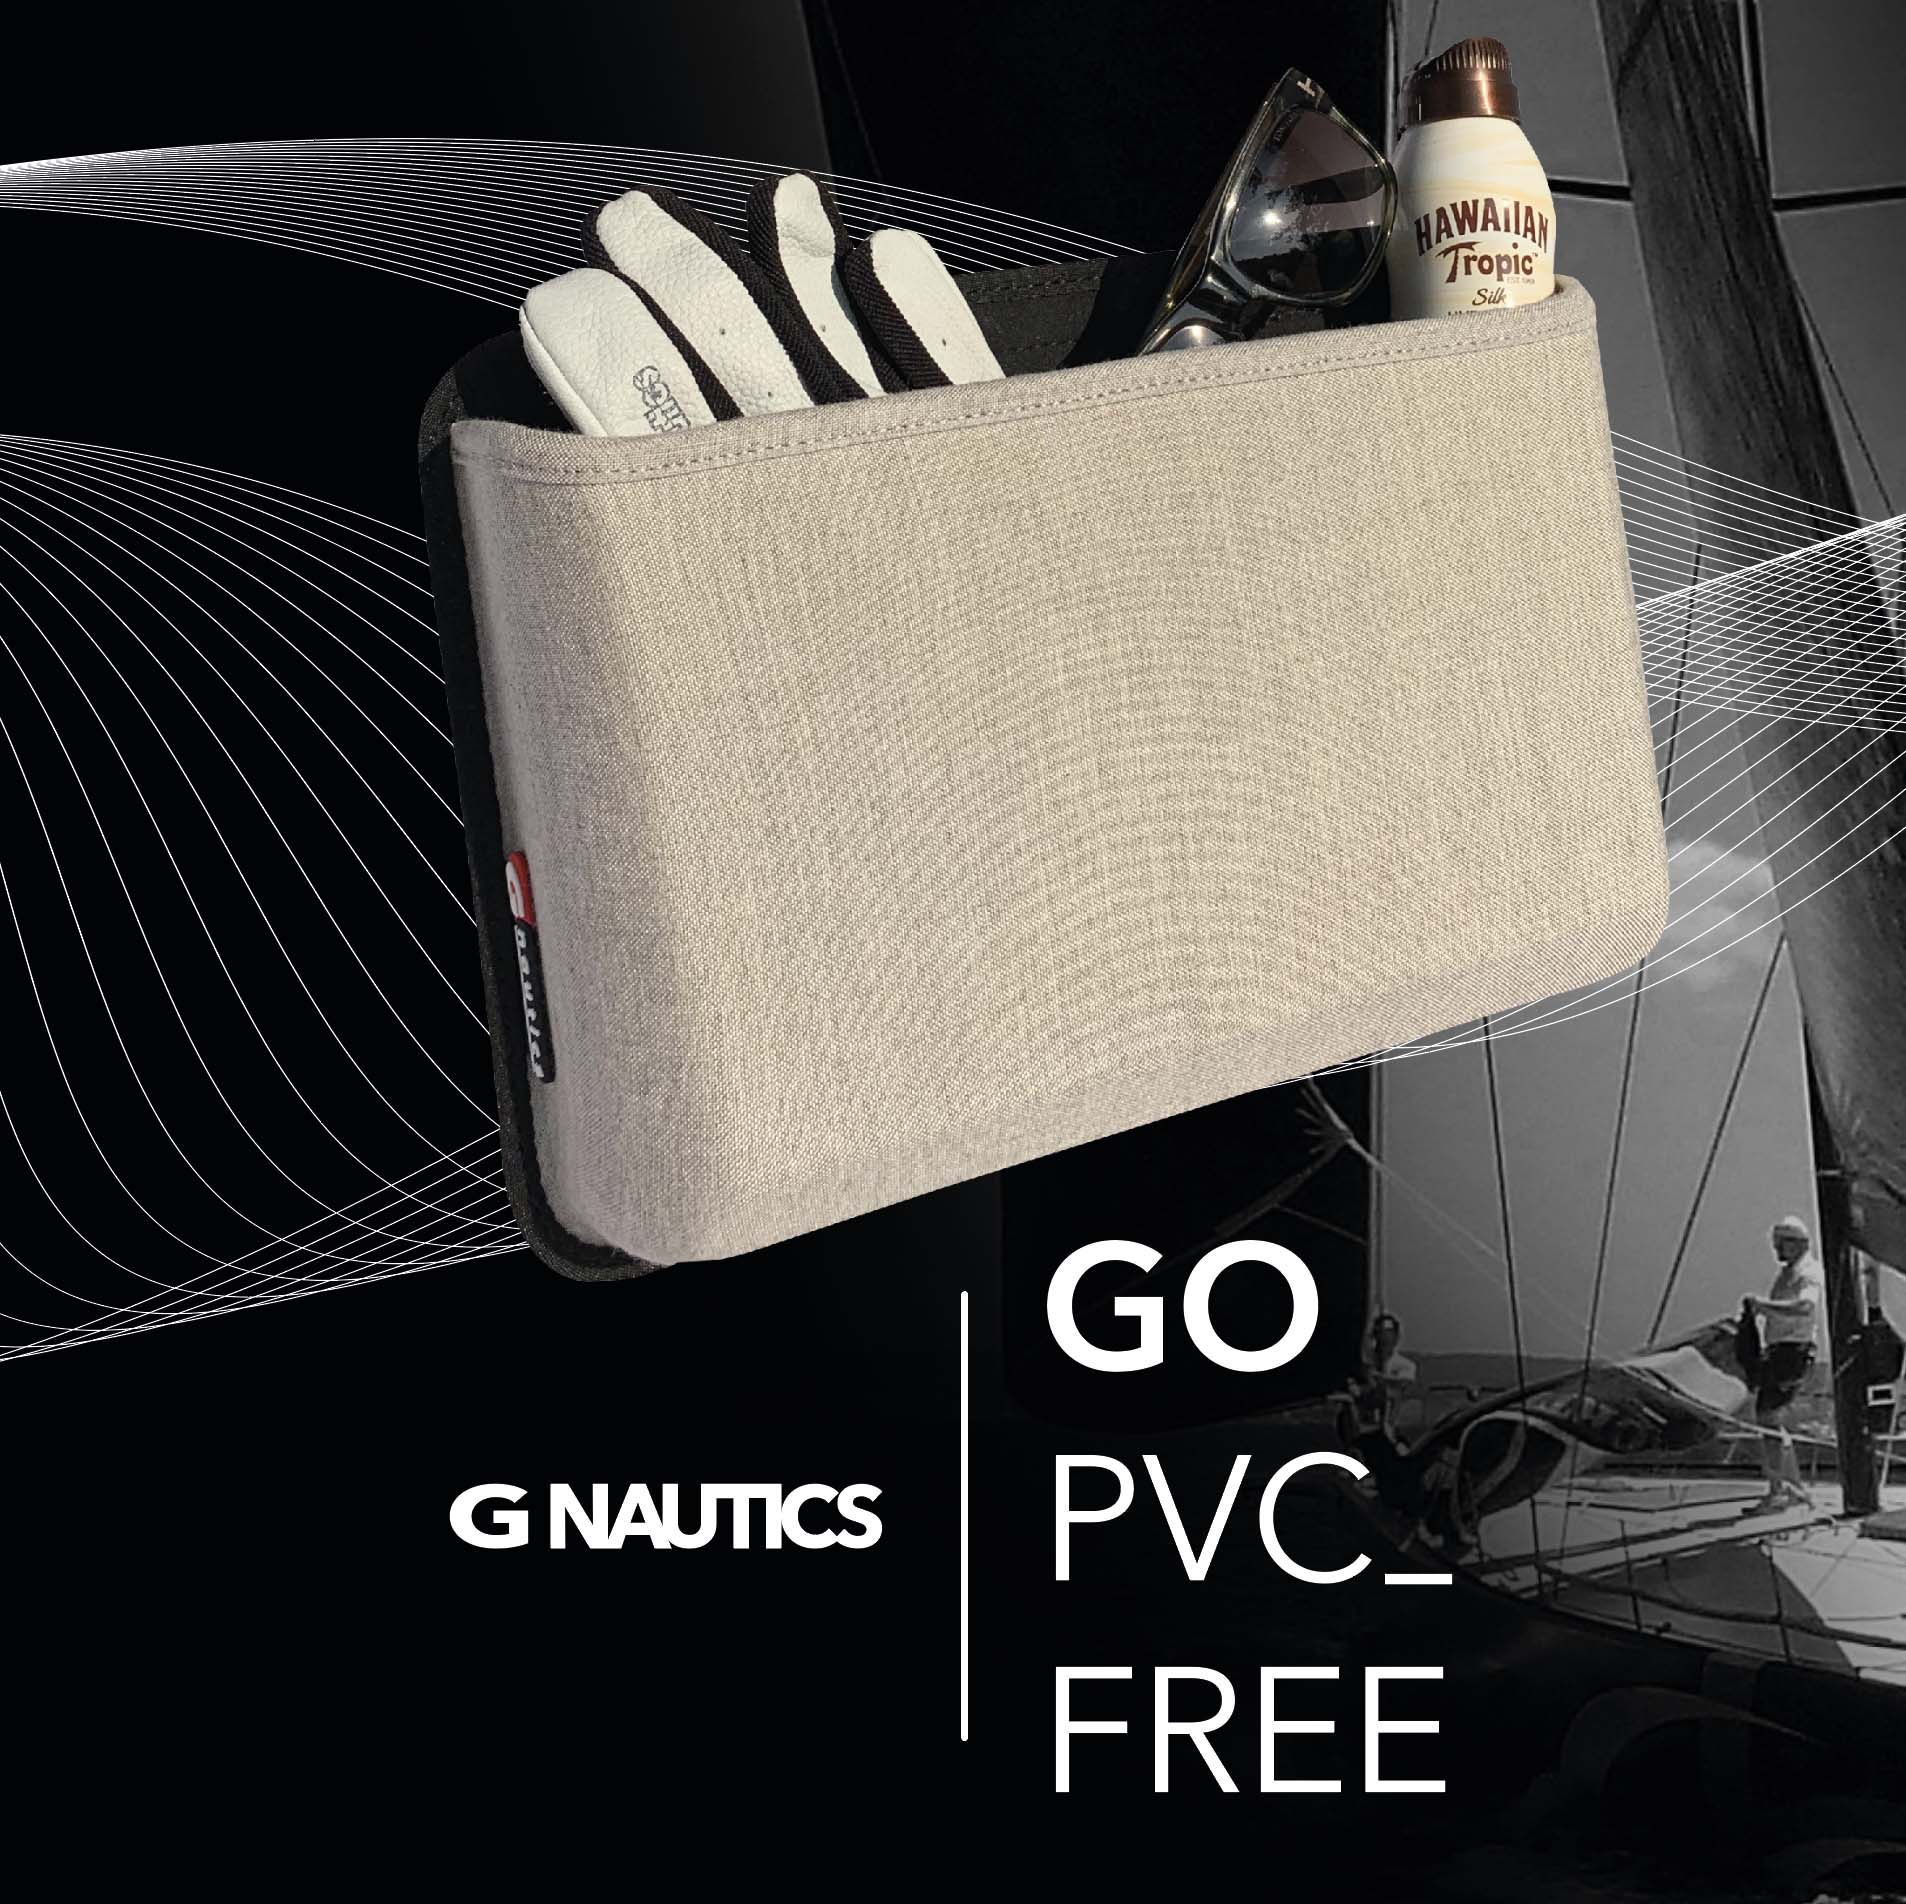 PVC-Free iQ cockpit bag sant